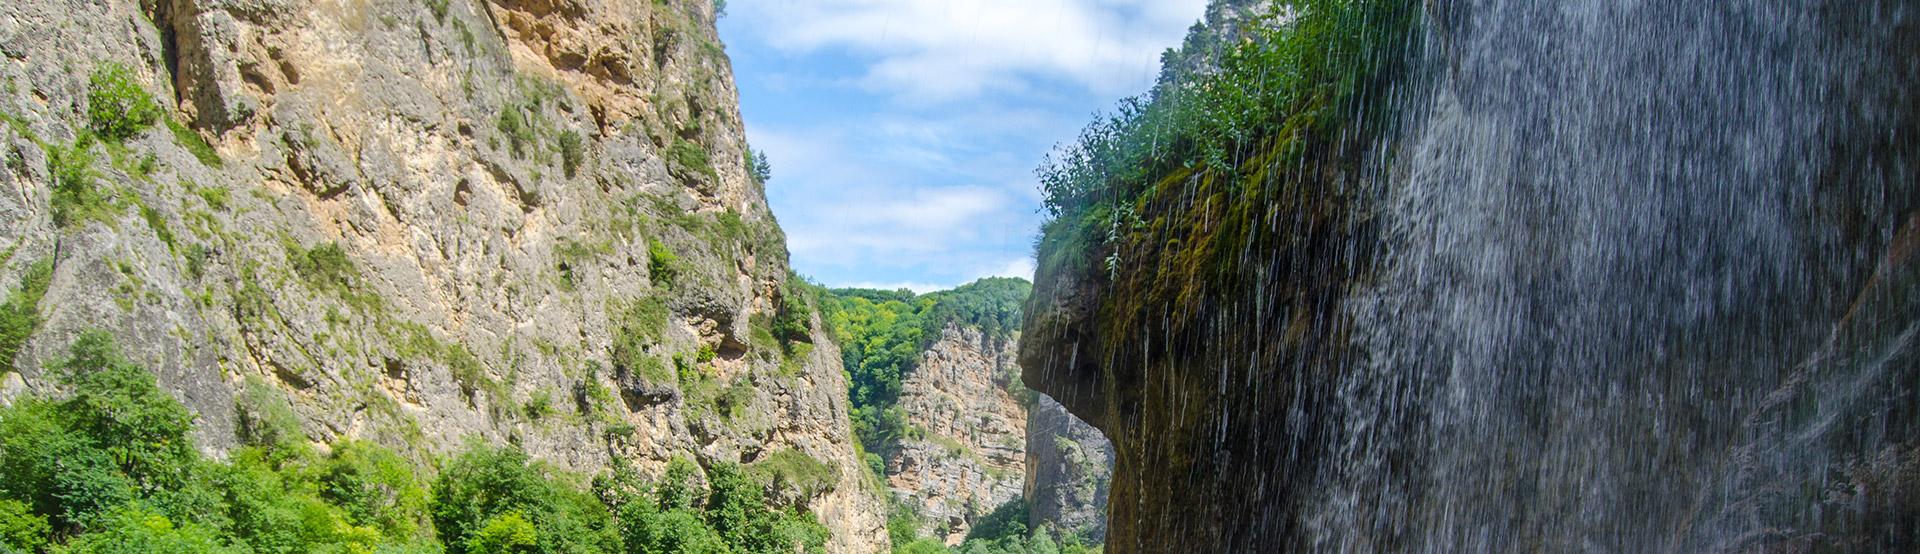 Голубые озера Кабардино-Балкарии – ПУТЕВОДИТЕЛЬ ПО КАВКАЗУ